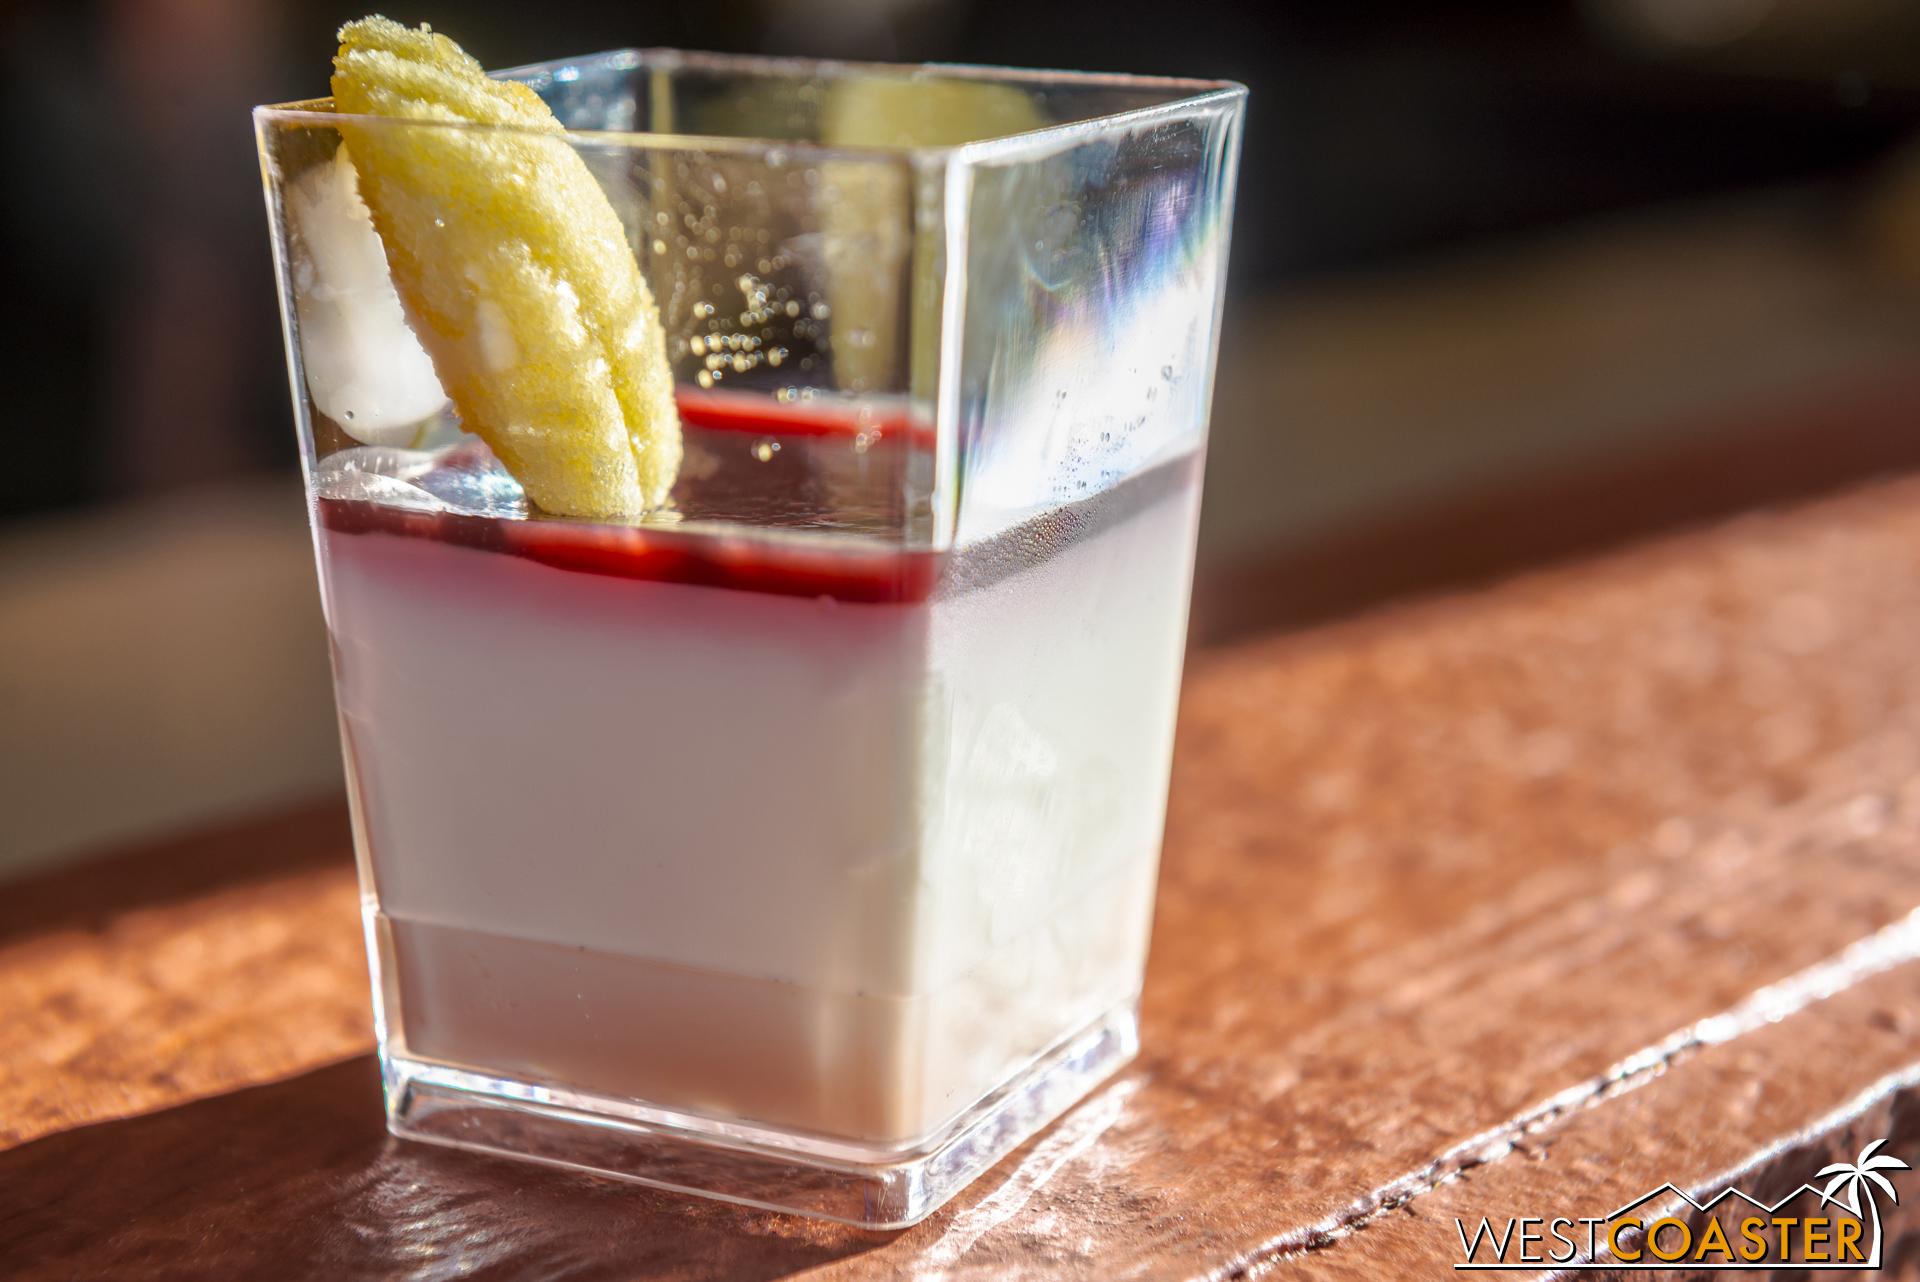 From Olive Us:  Vanilla Bean Crème Fraîche Panna Cotta  with Amarena Cherry Jus and EVOO Madeleine ($4.25)